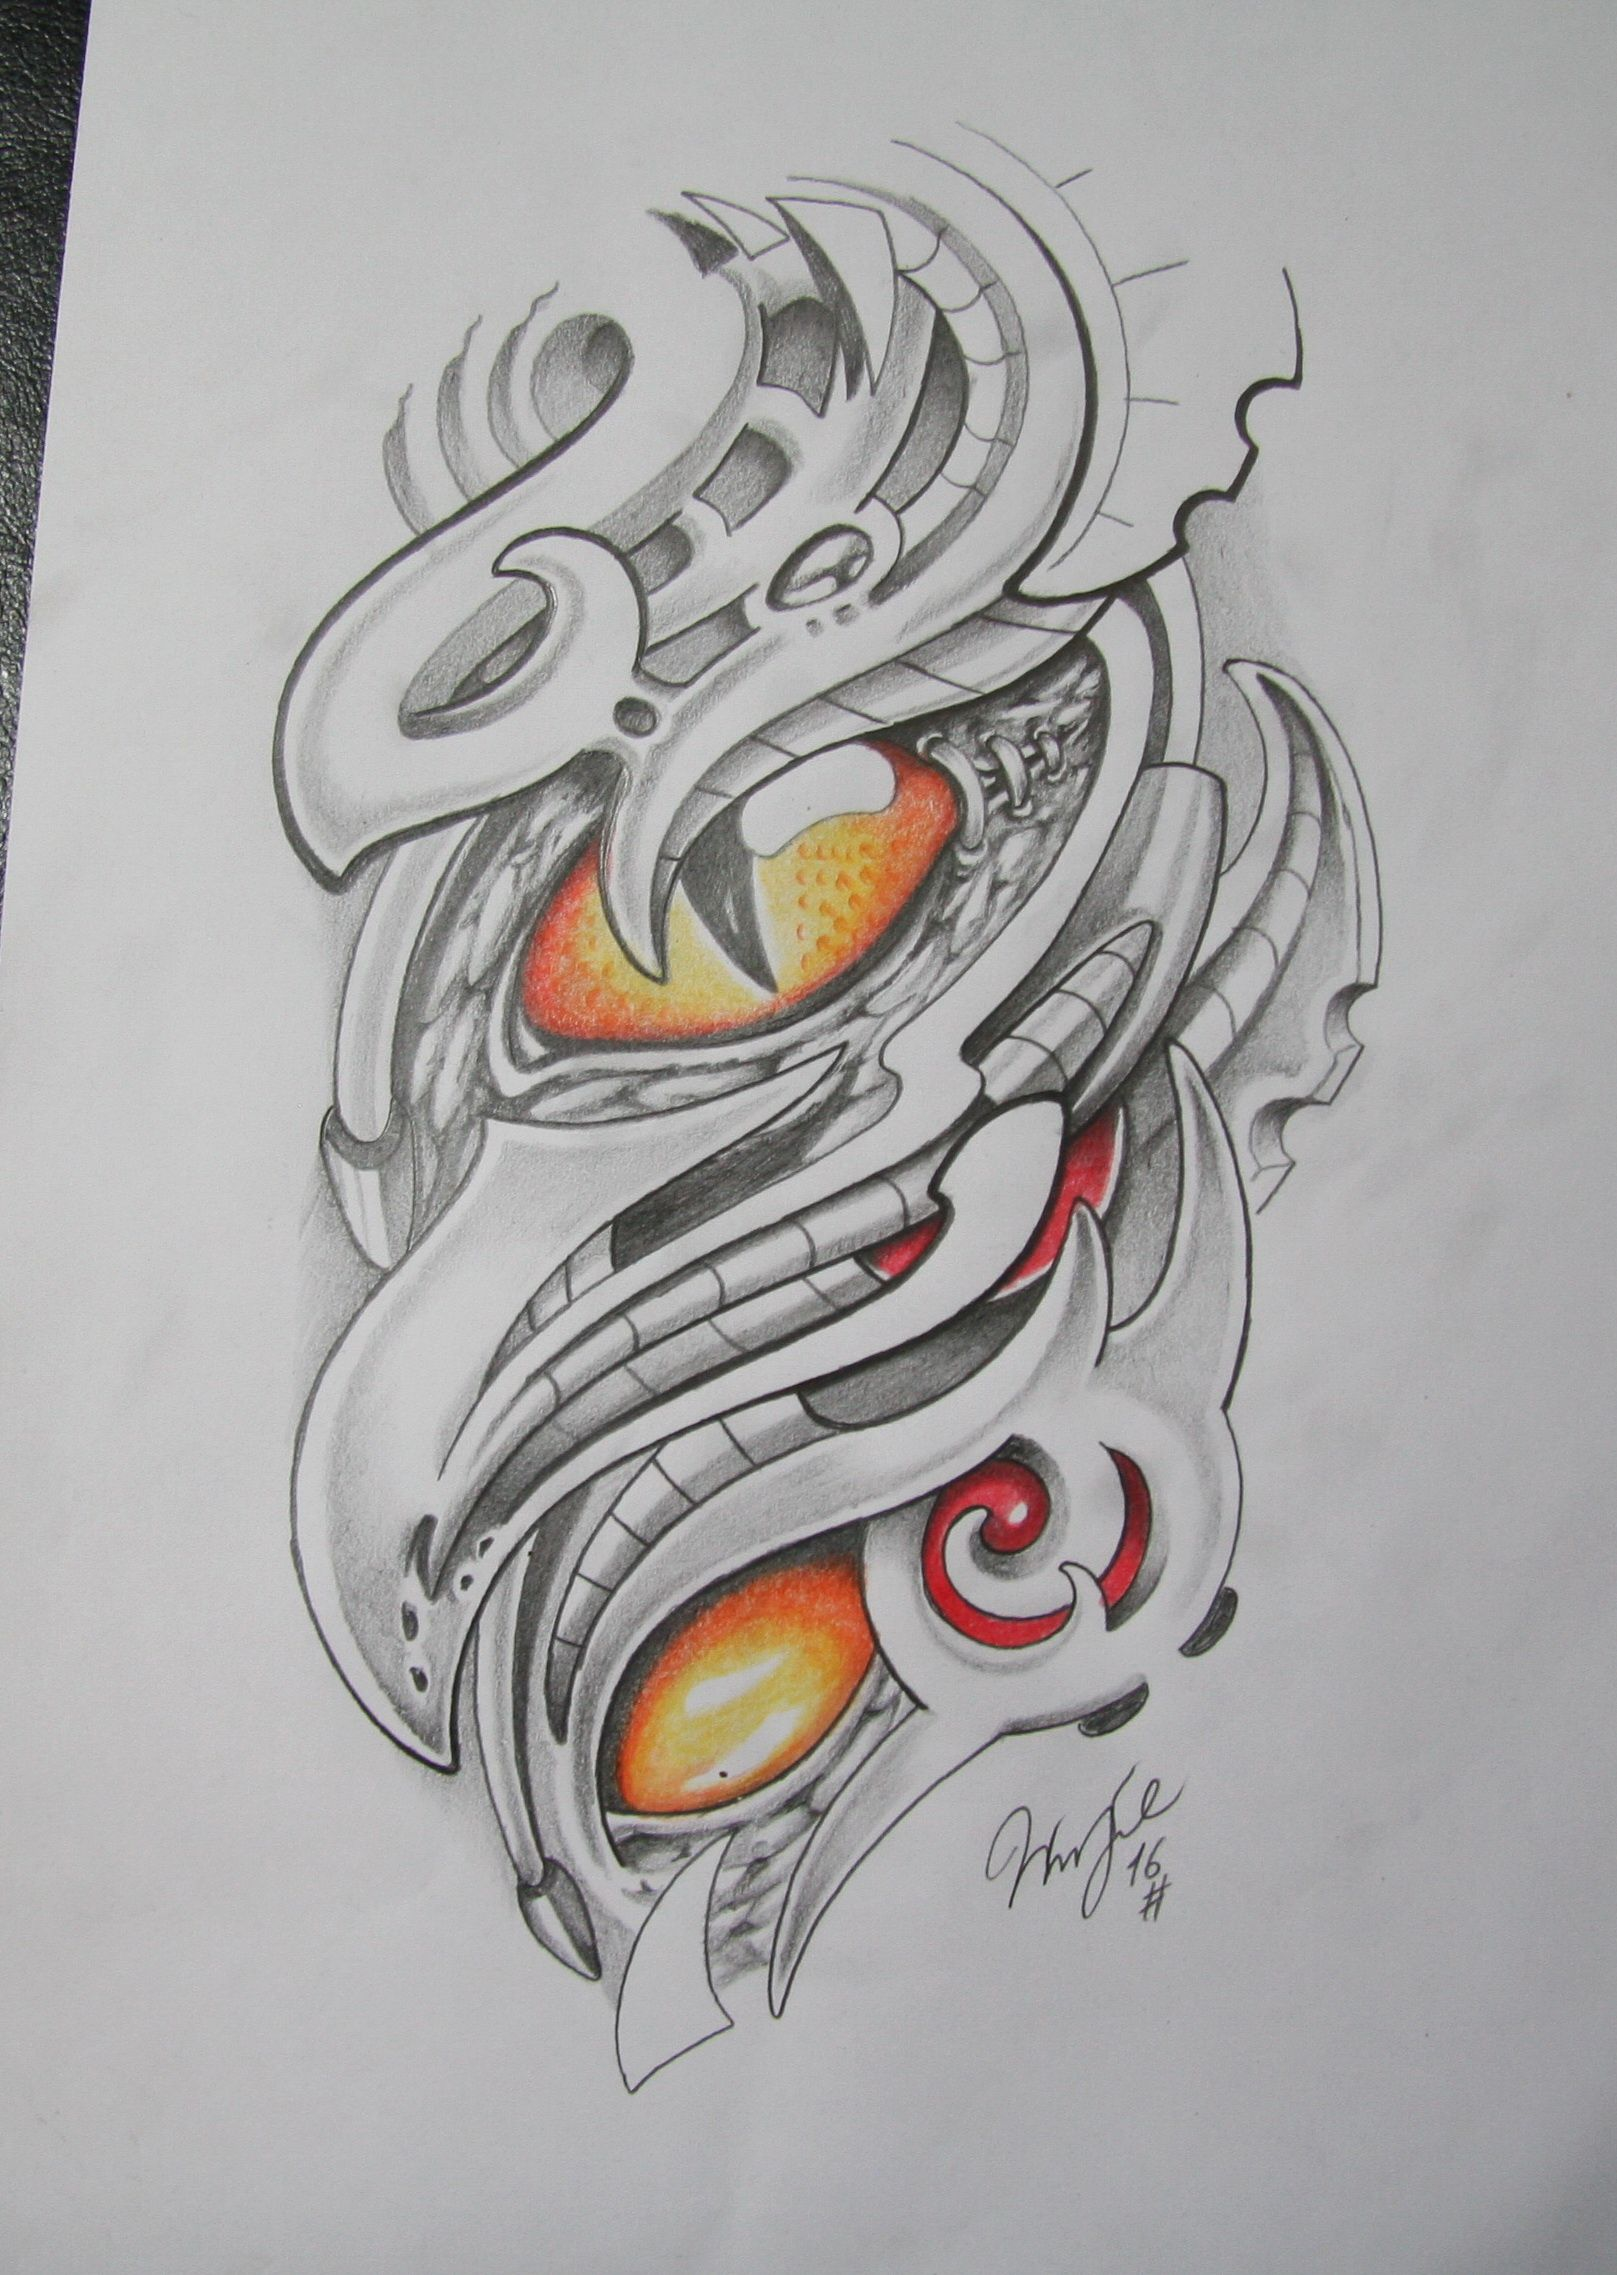 Pin By Swammain On Biomechanical Tattoo Tattoo Art Drawings Skull Tattoo Design Biomechanical Tattoo